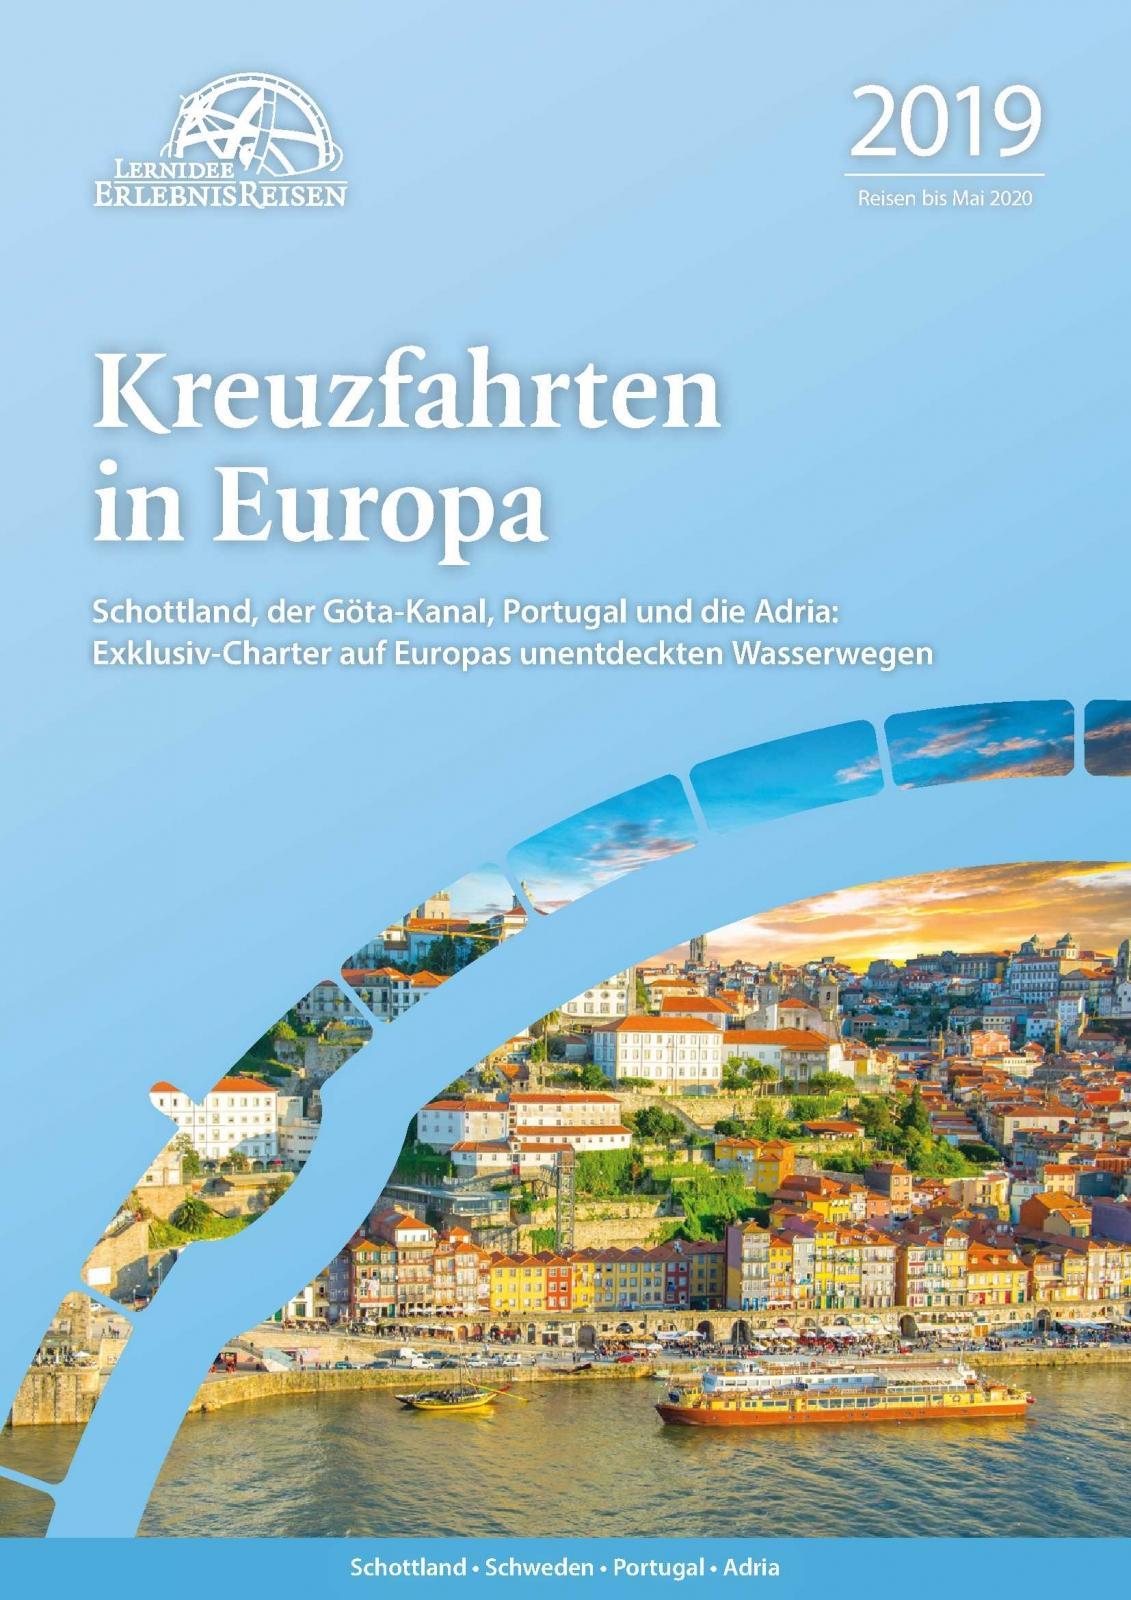 Kreuzfahrten in Europa 2019